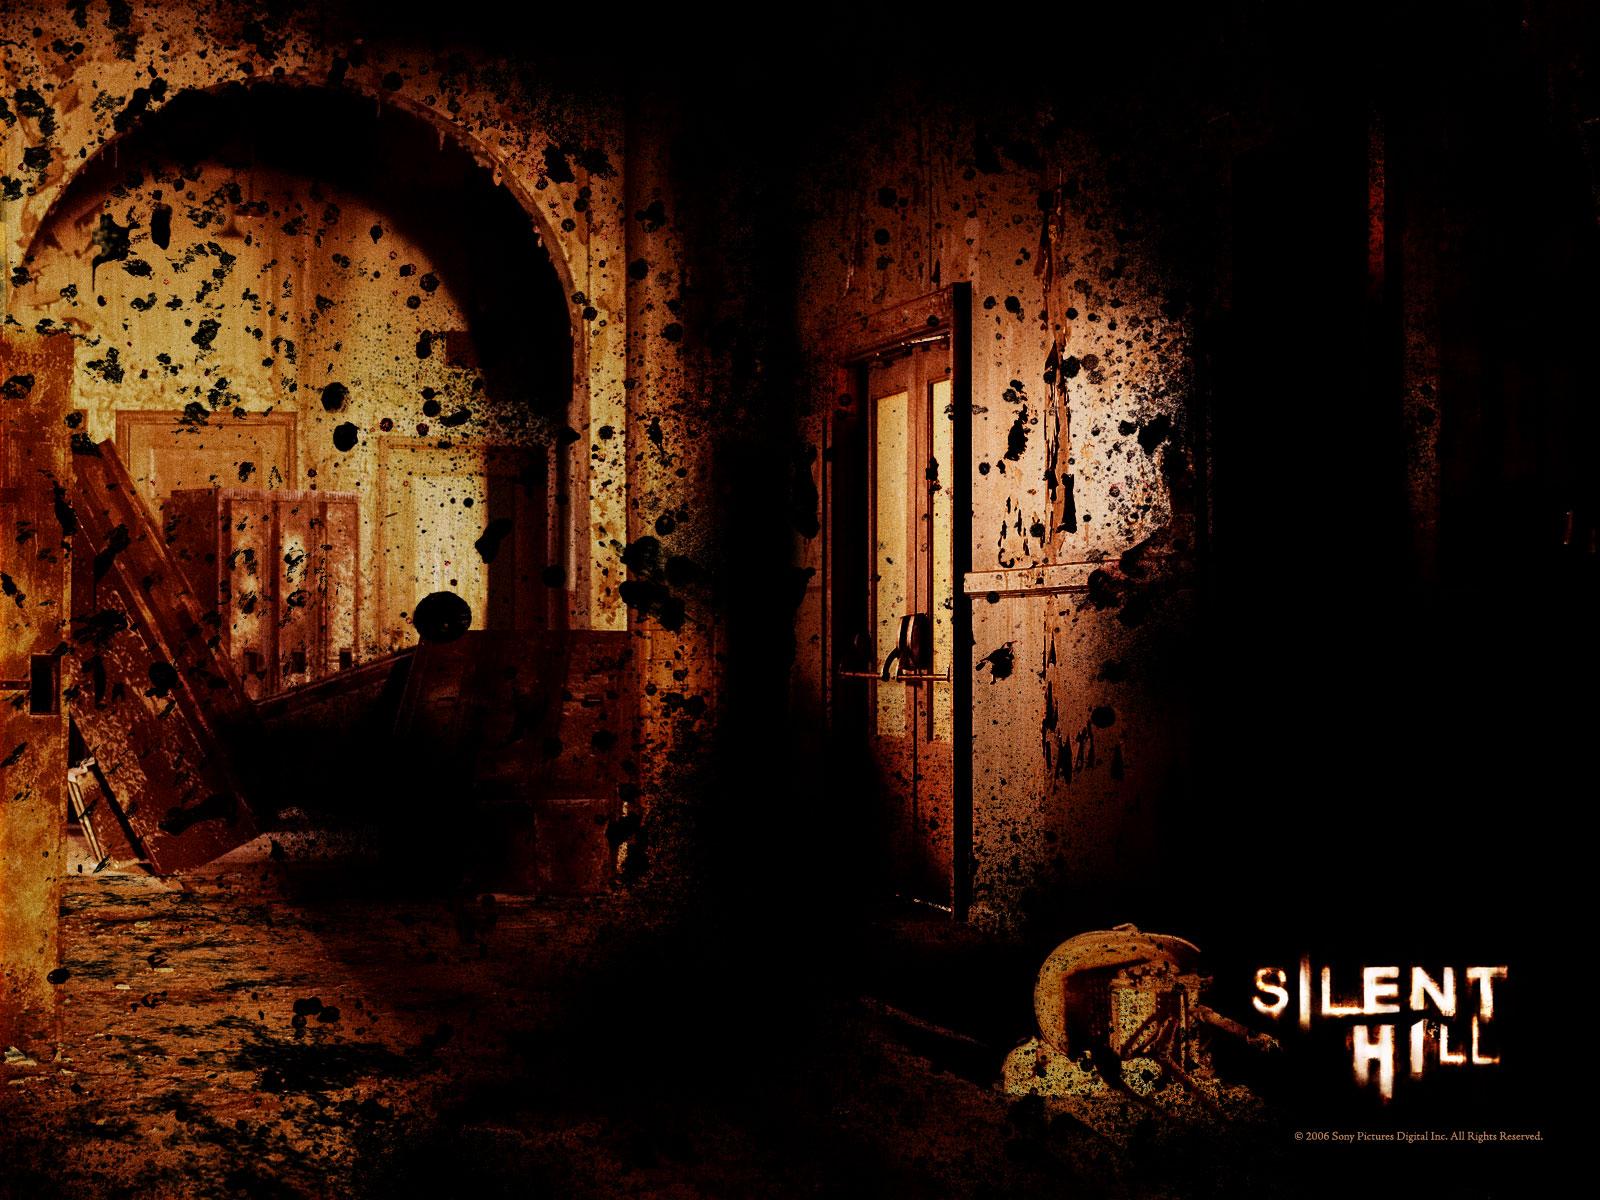 http://1.bp.blogspot.com/-csu4fNLkC2I/UBQ77NzQ4ZI/AAAAAAAABsc/VpFwqX8q-yU/s1600/silent-hill-wallpaper-14-1600.jpg